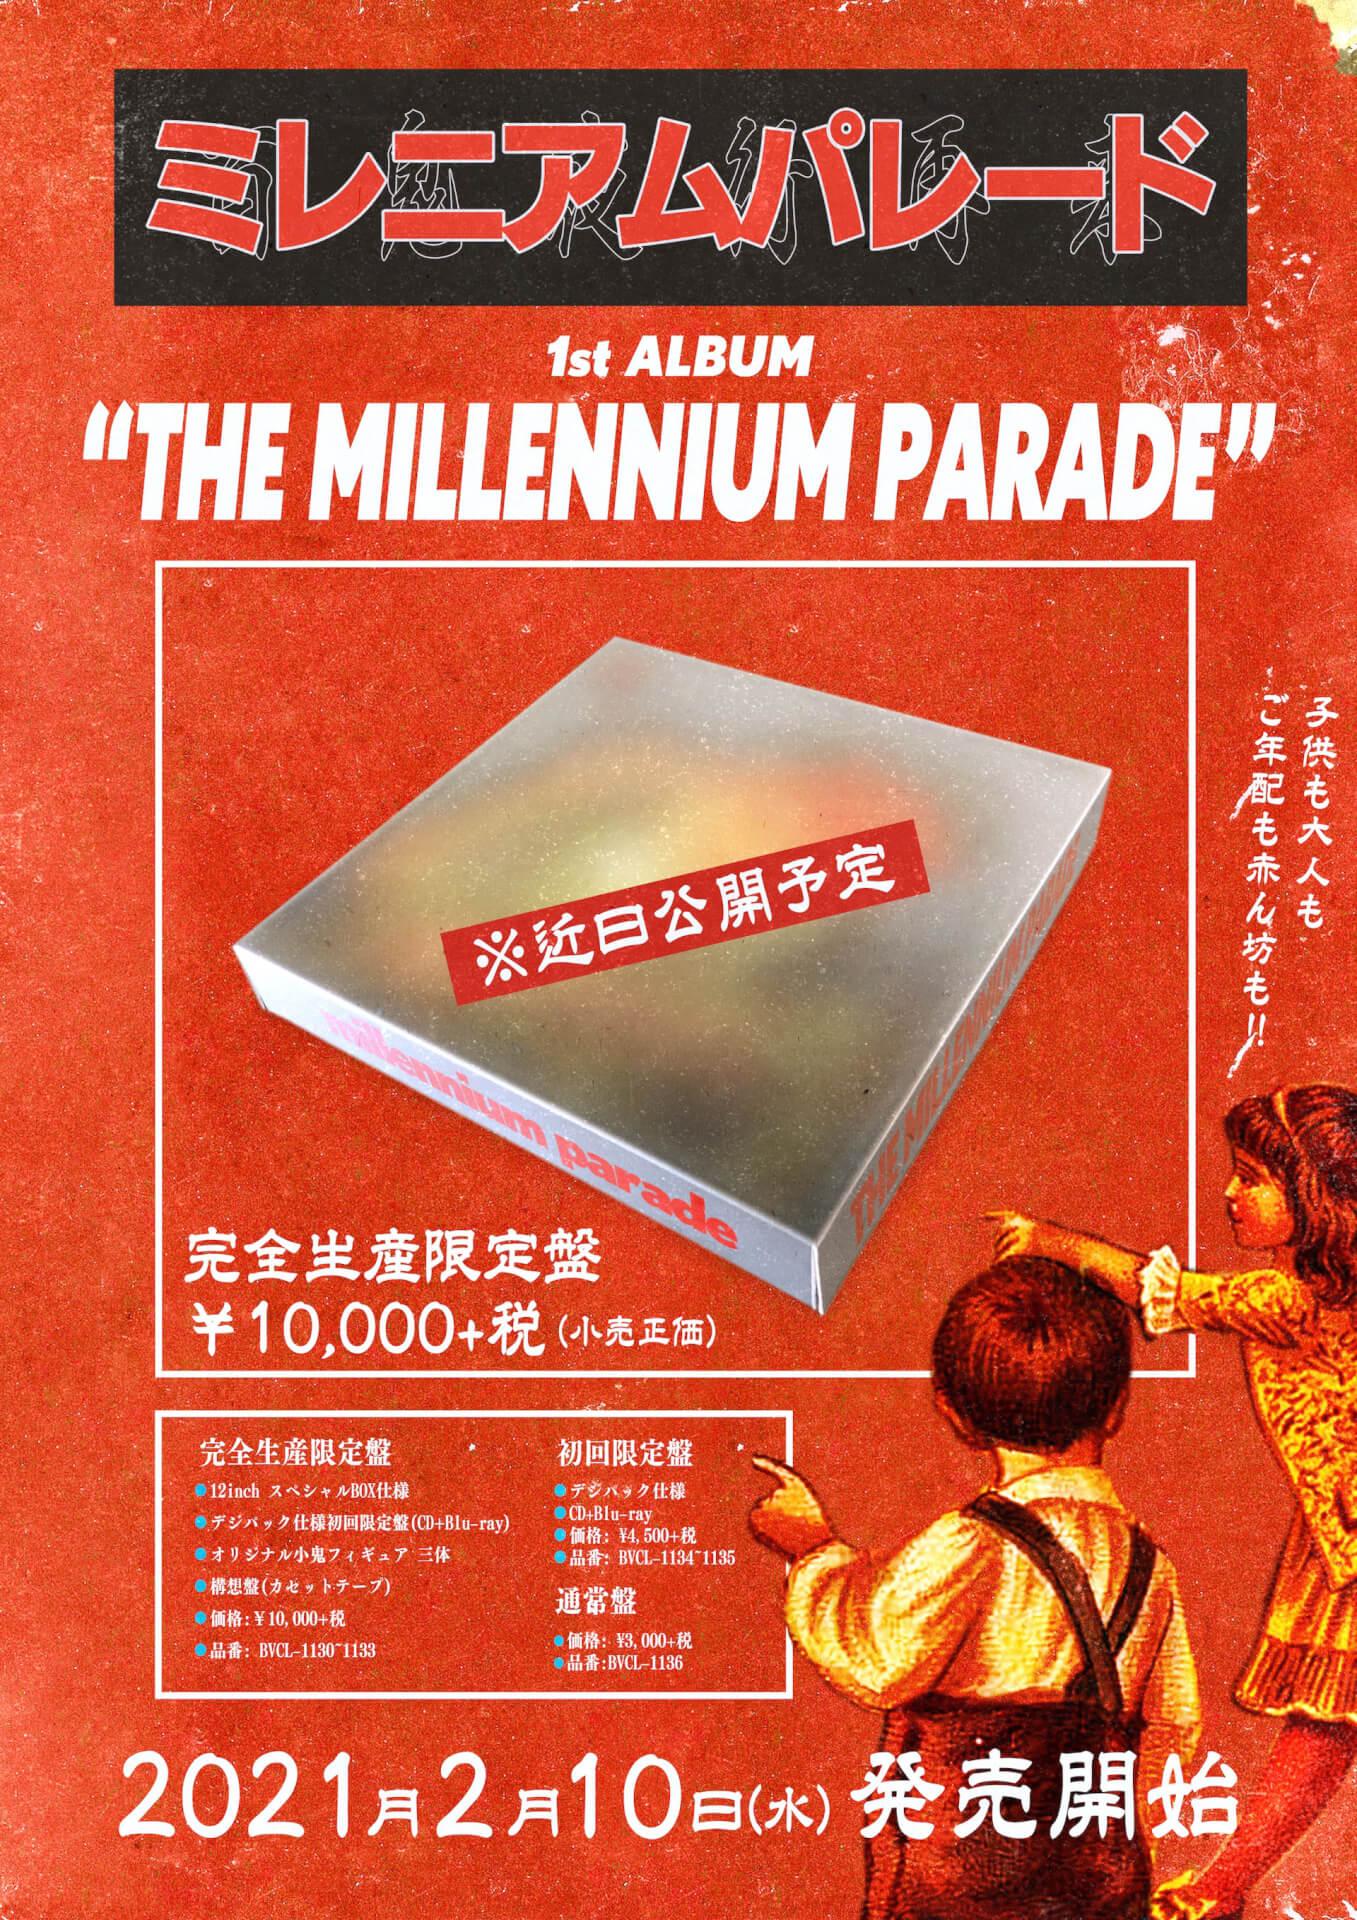 King Gnu常田大希のソロプロジェクト・millennium paradeの1stアルバムがリリース決定!3Dライブの開催も発表 music201125_millenniumparade_1